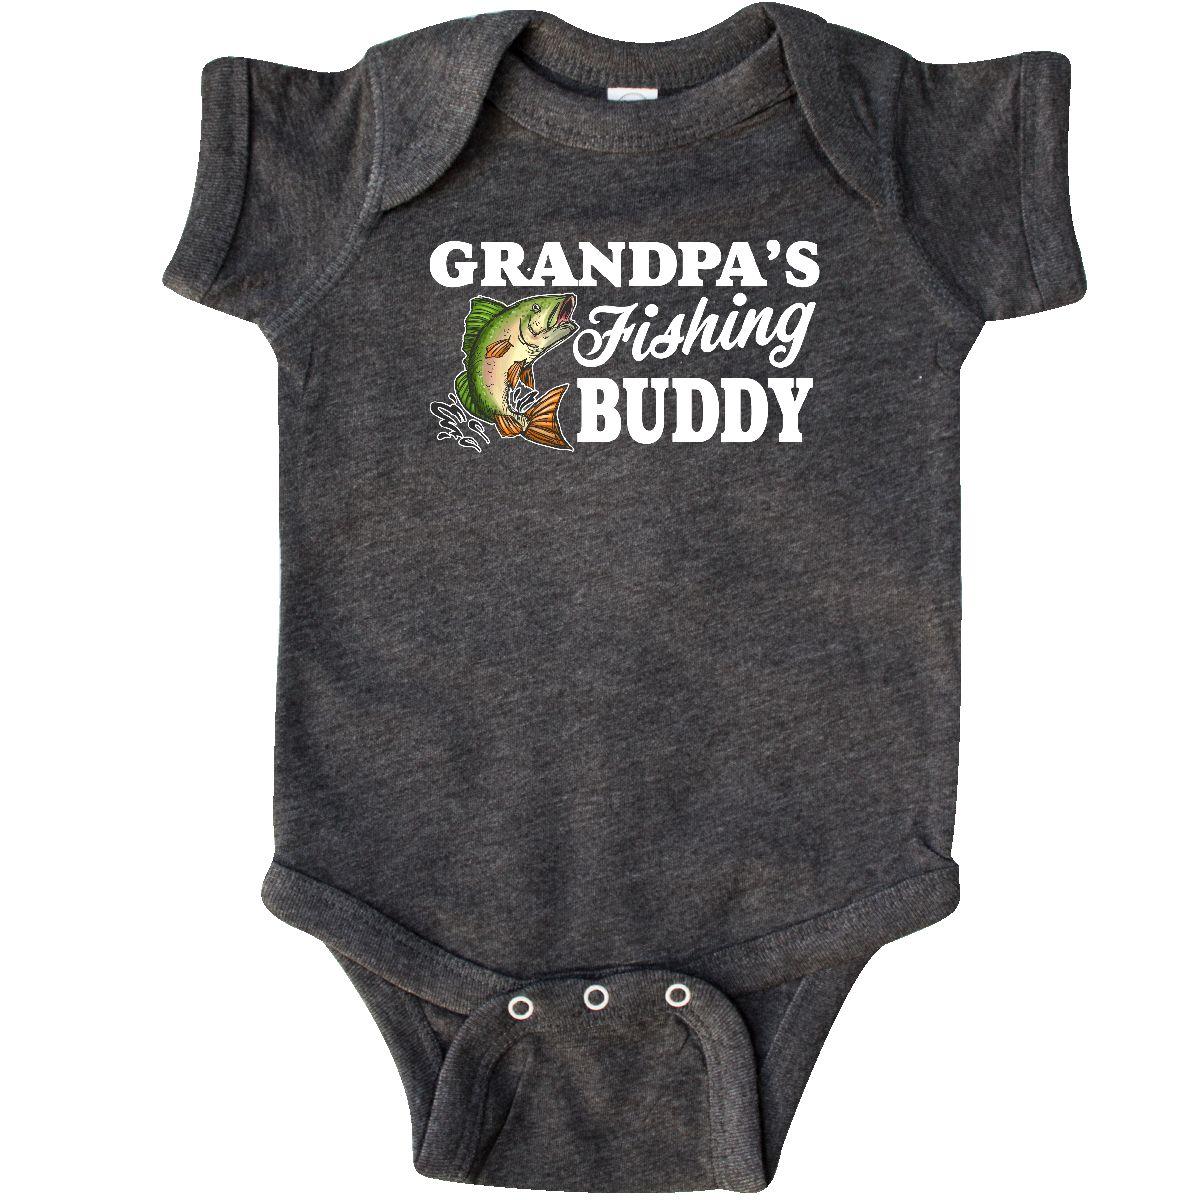 9e4ed636cff0c Inktastic Grandpa's Fishing Buddy With White Text Infant Creeper ...